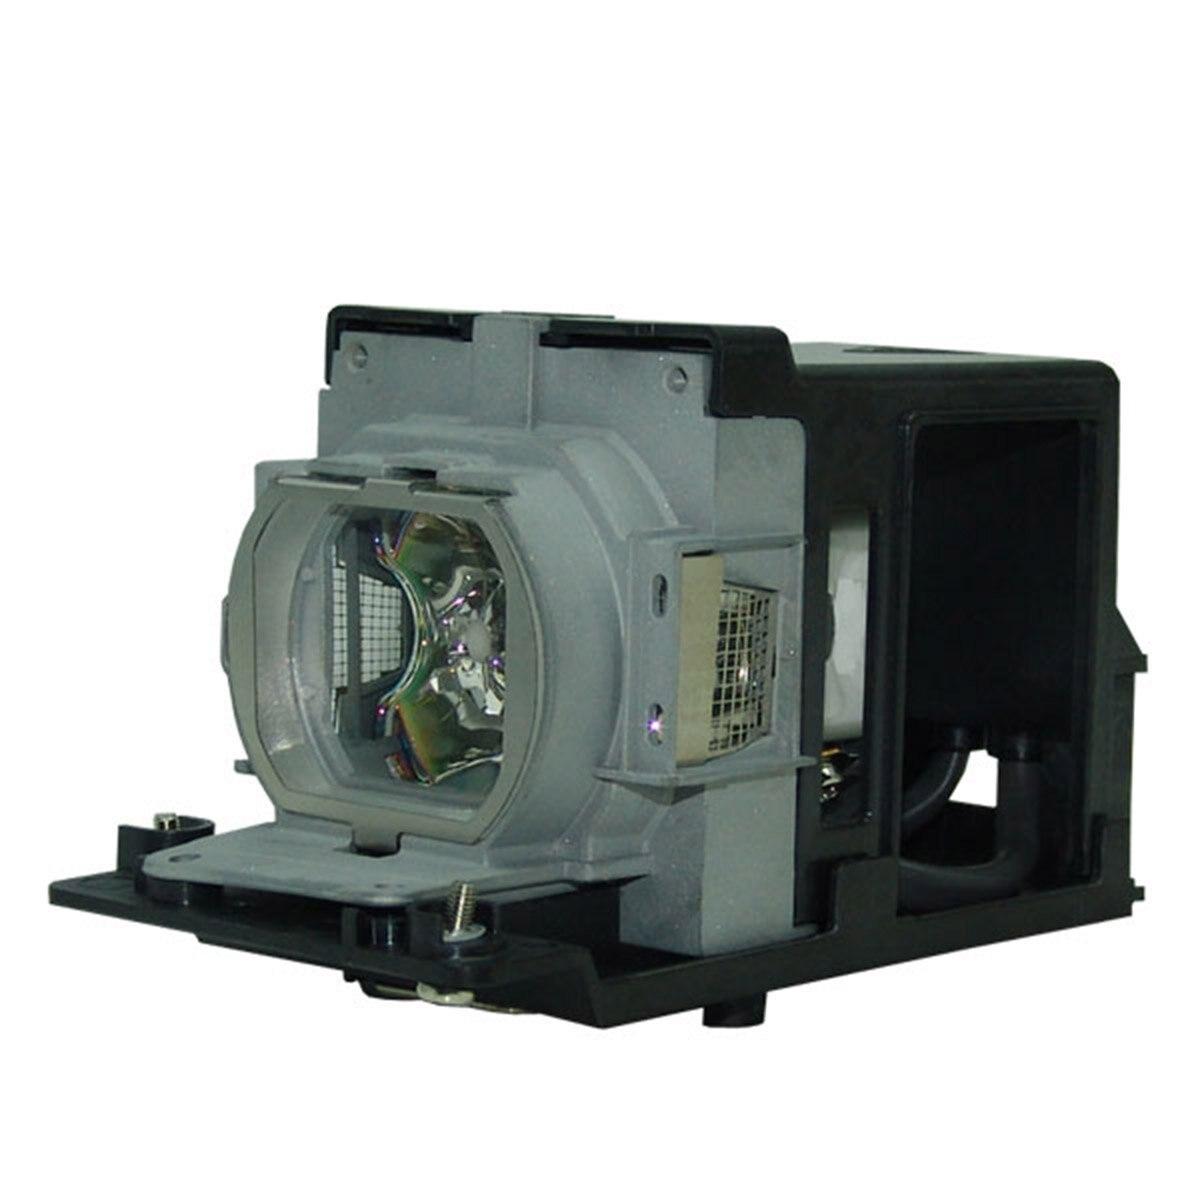 TLPLW11 TLP-LW11 for TOSHIBA TLP-X2000 TLP-XD2000 TLP-WX2200 TLP-XC2500 TLP-X2500 TDP-XD3000 TLP-XC2000 Projector Bulb Lamp free shipping projector bare lamp tlplw11 for toshiba tlp xd2000 tlp xd2000u tlp wx2200 tlp wx2200uprojector 3pcs lot